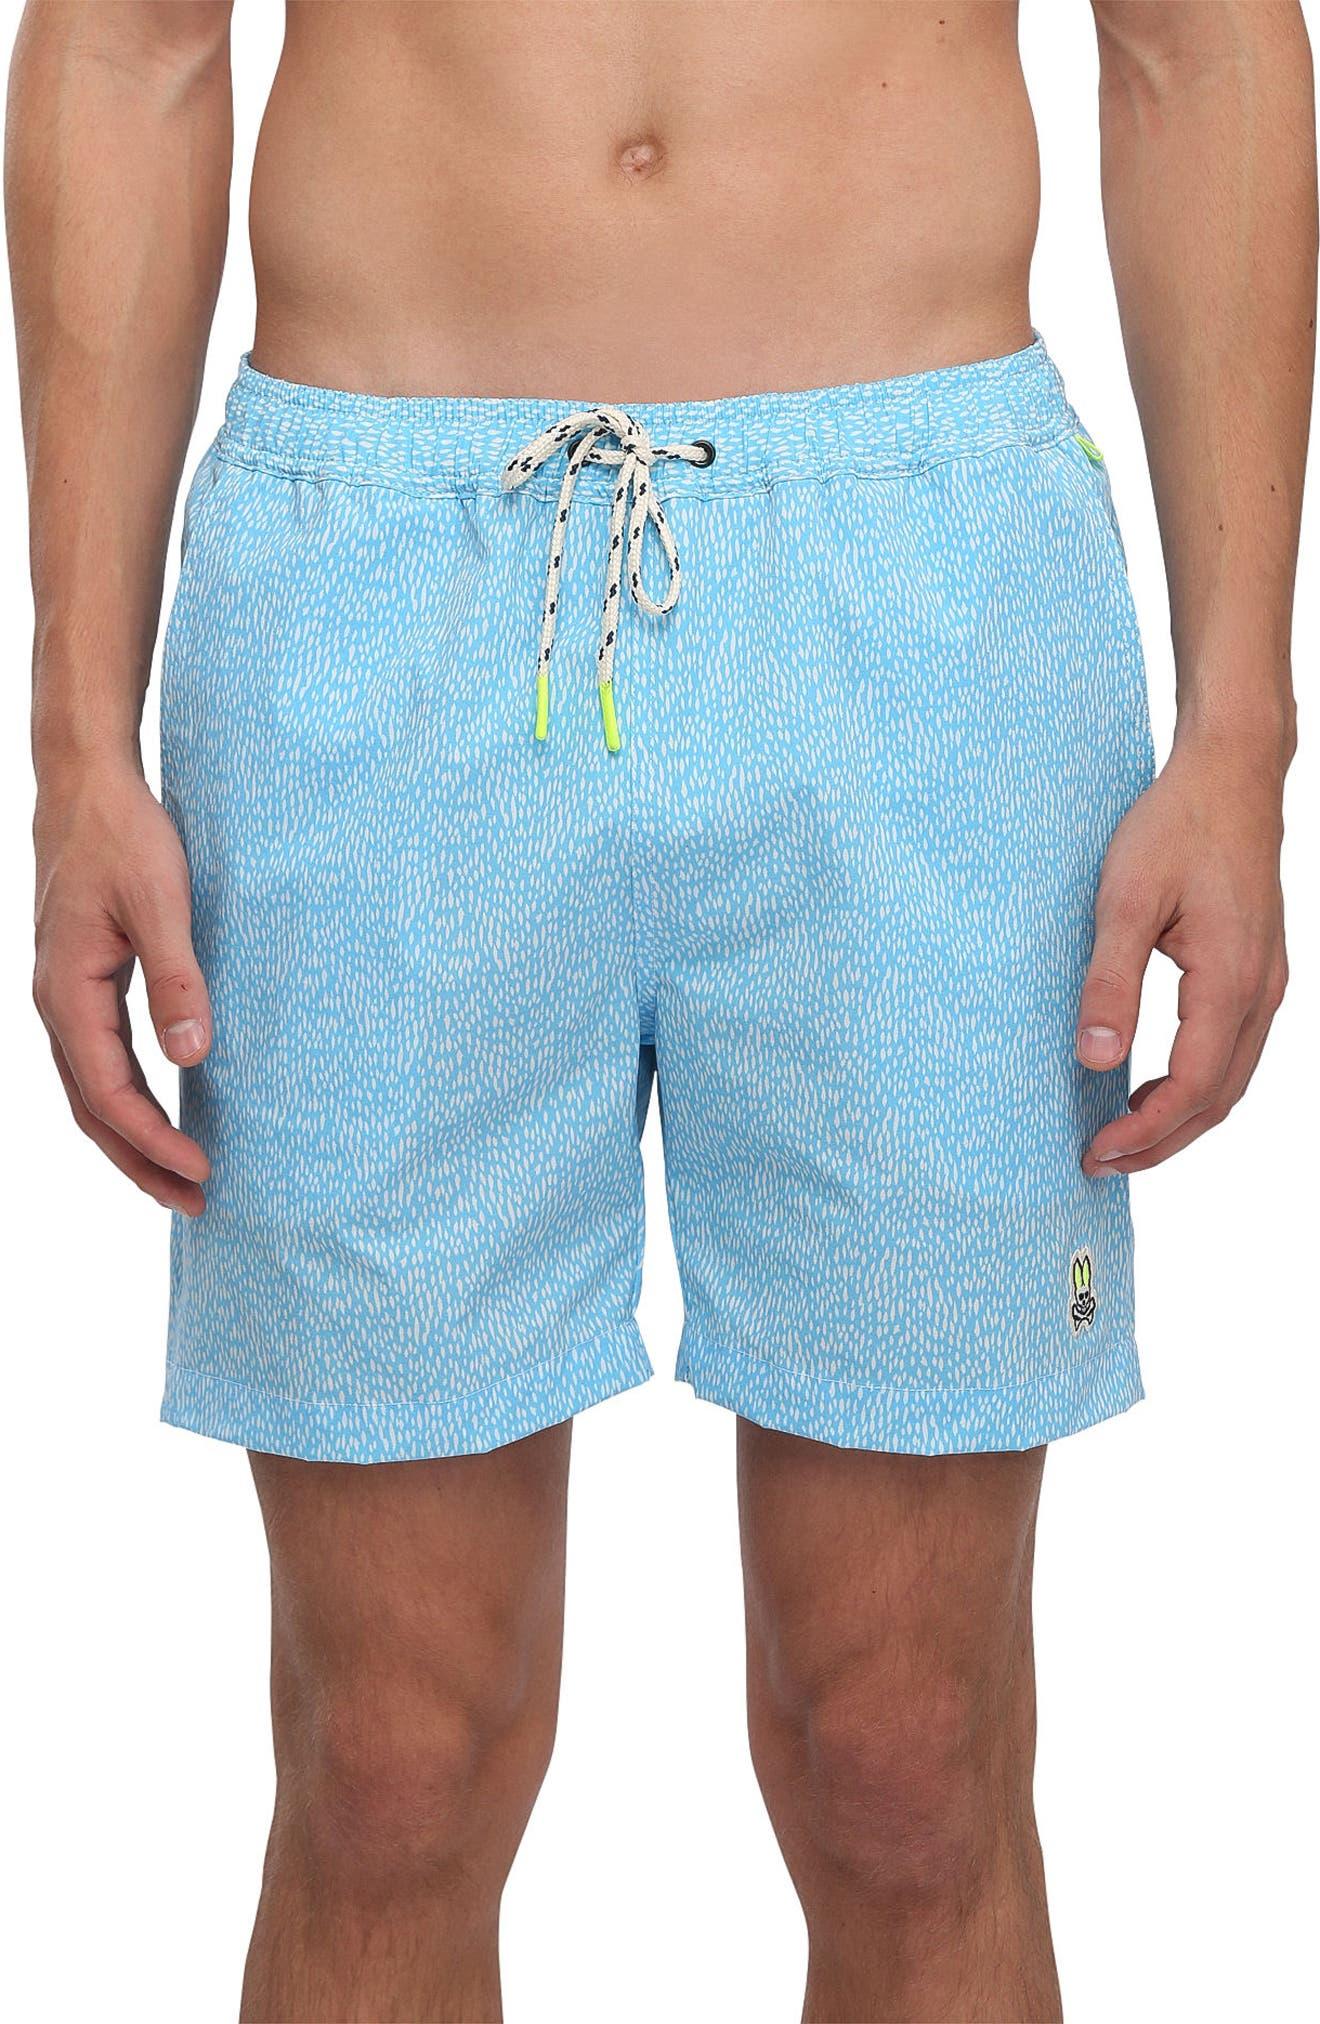 Alternate Image 1 Selected - Psycho Bunny Swim Shorts